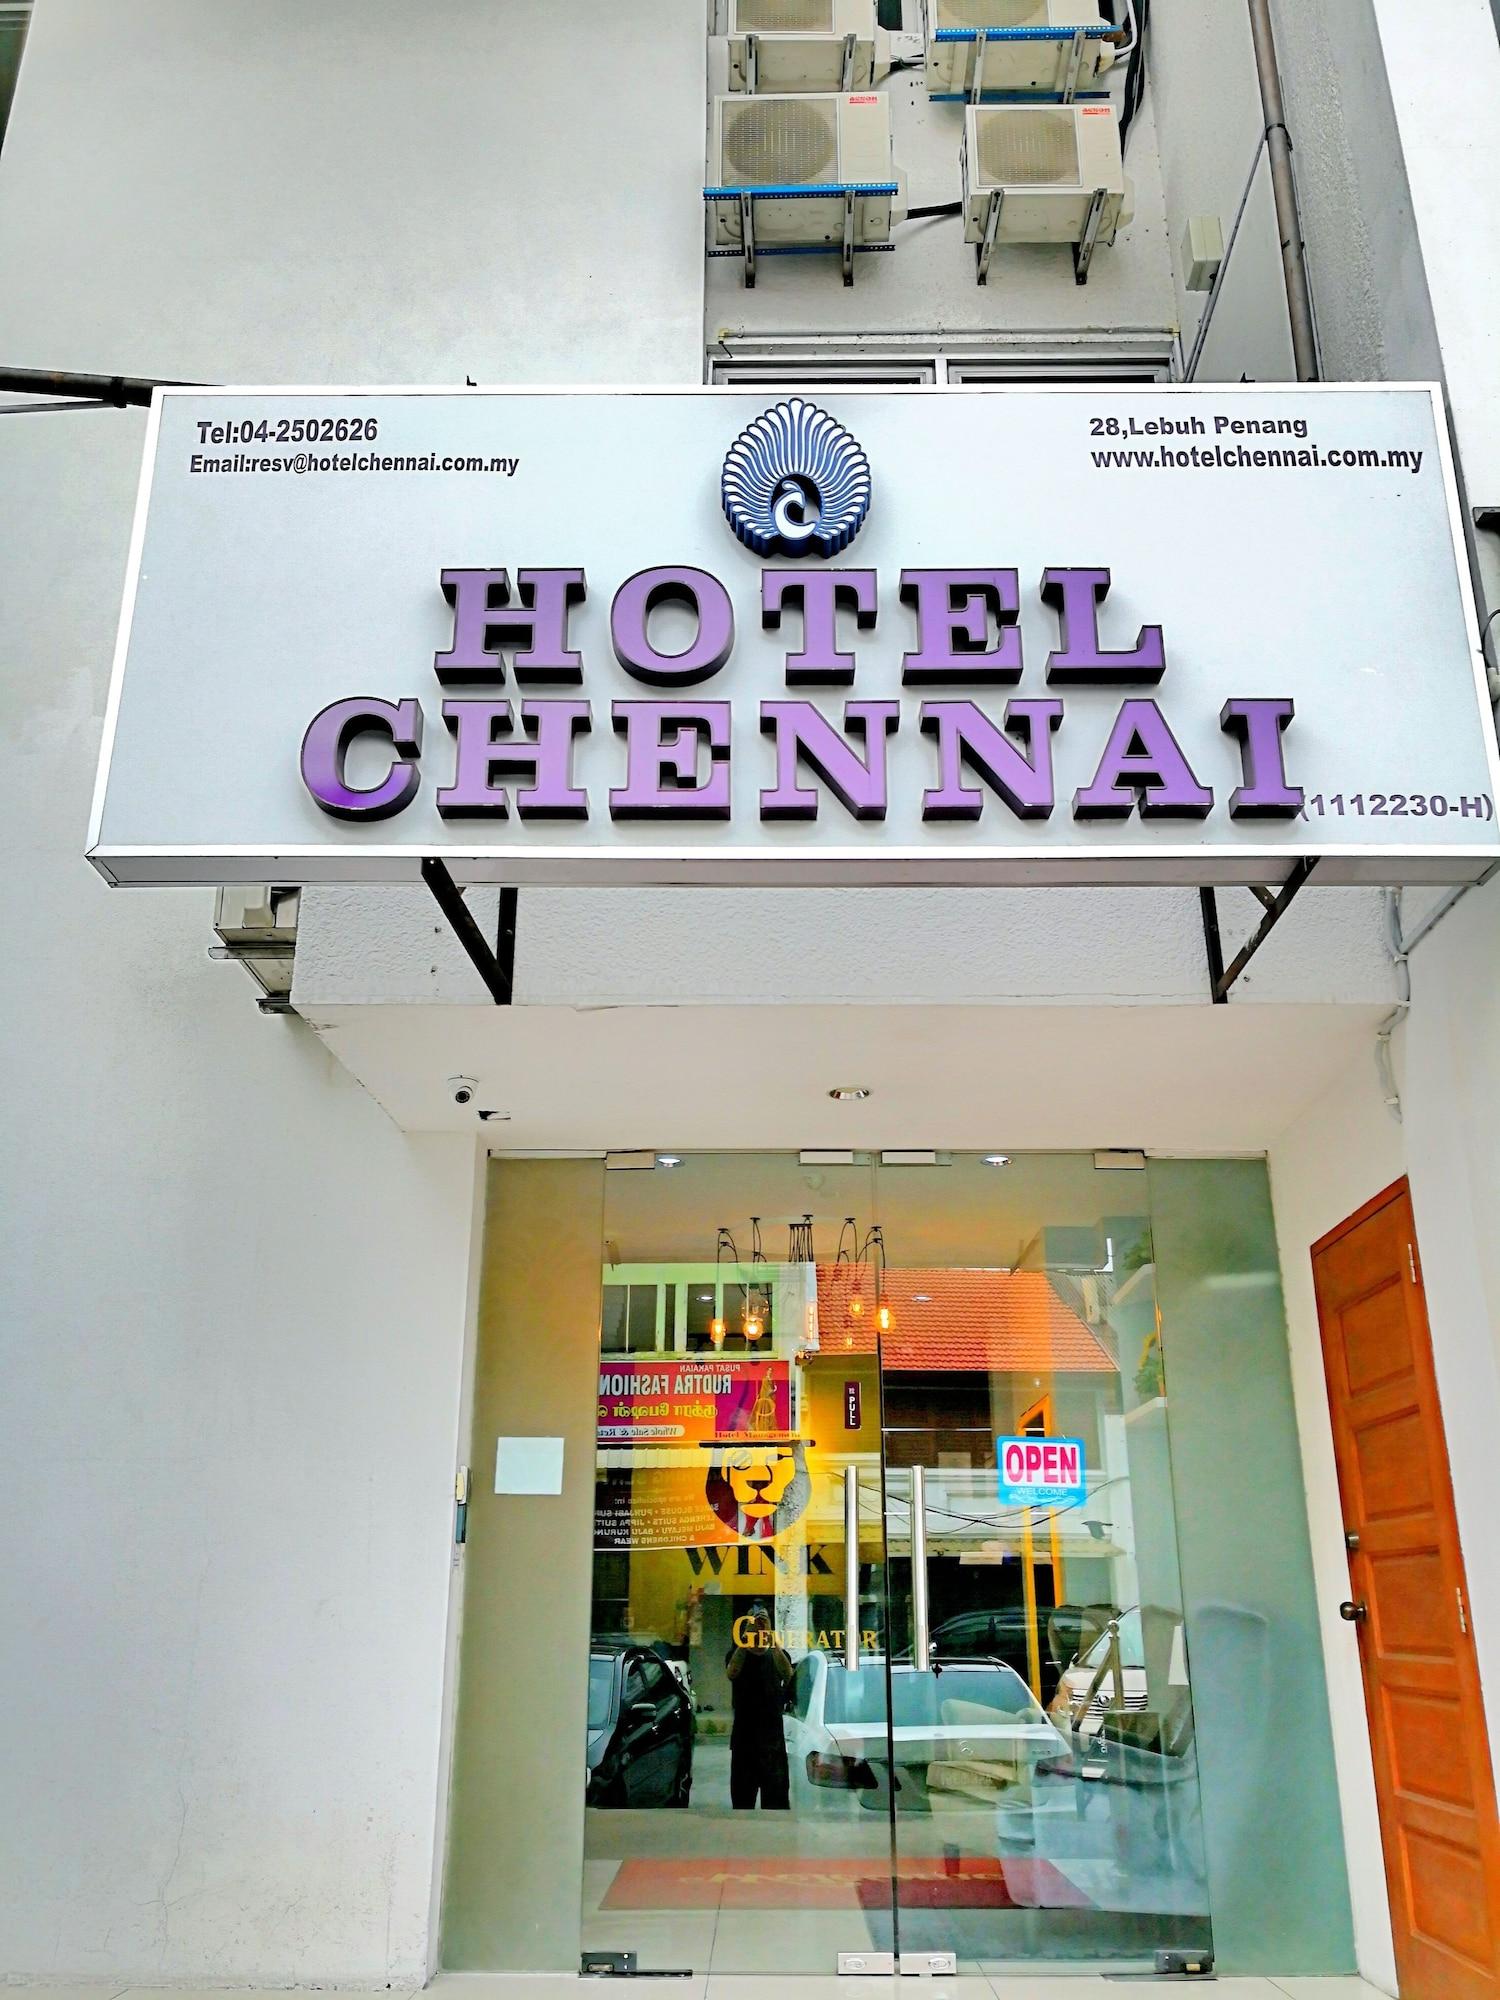 Hotel Chennai By Wink, Pulau Penang